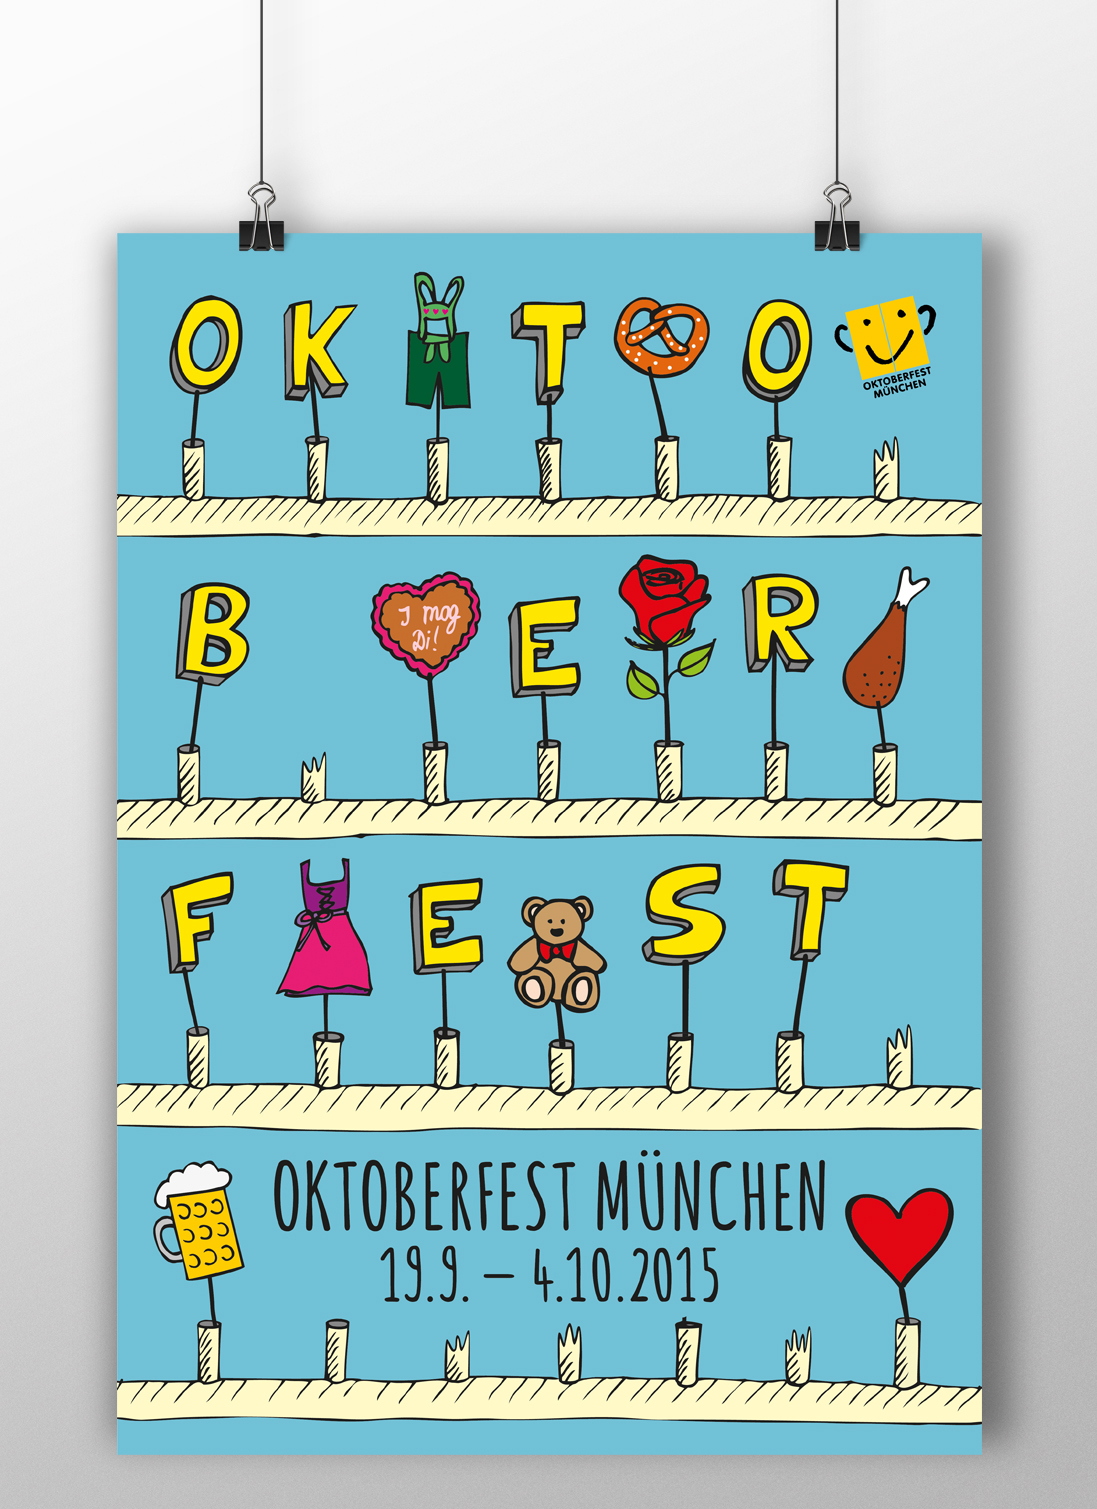 oktoberfest,octoberfest,poster,plakat,munich,München,Bavaria,beer